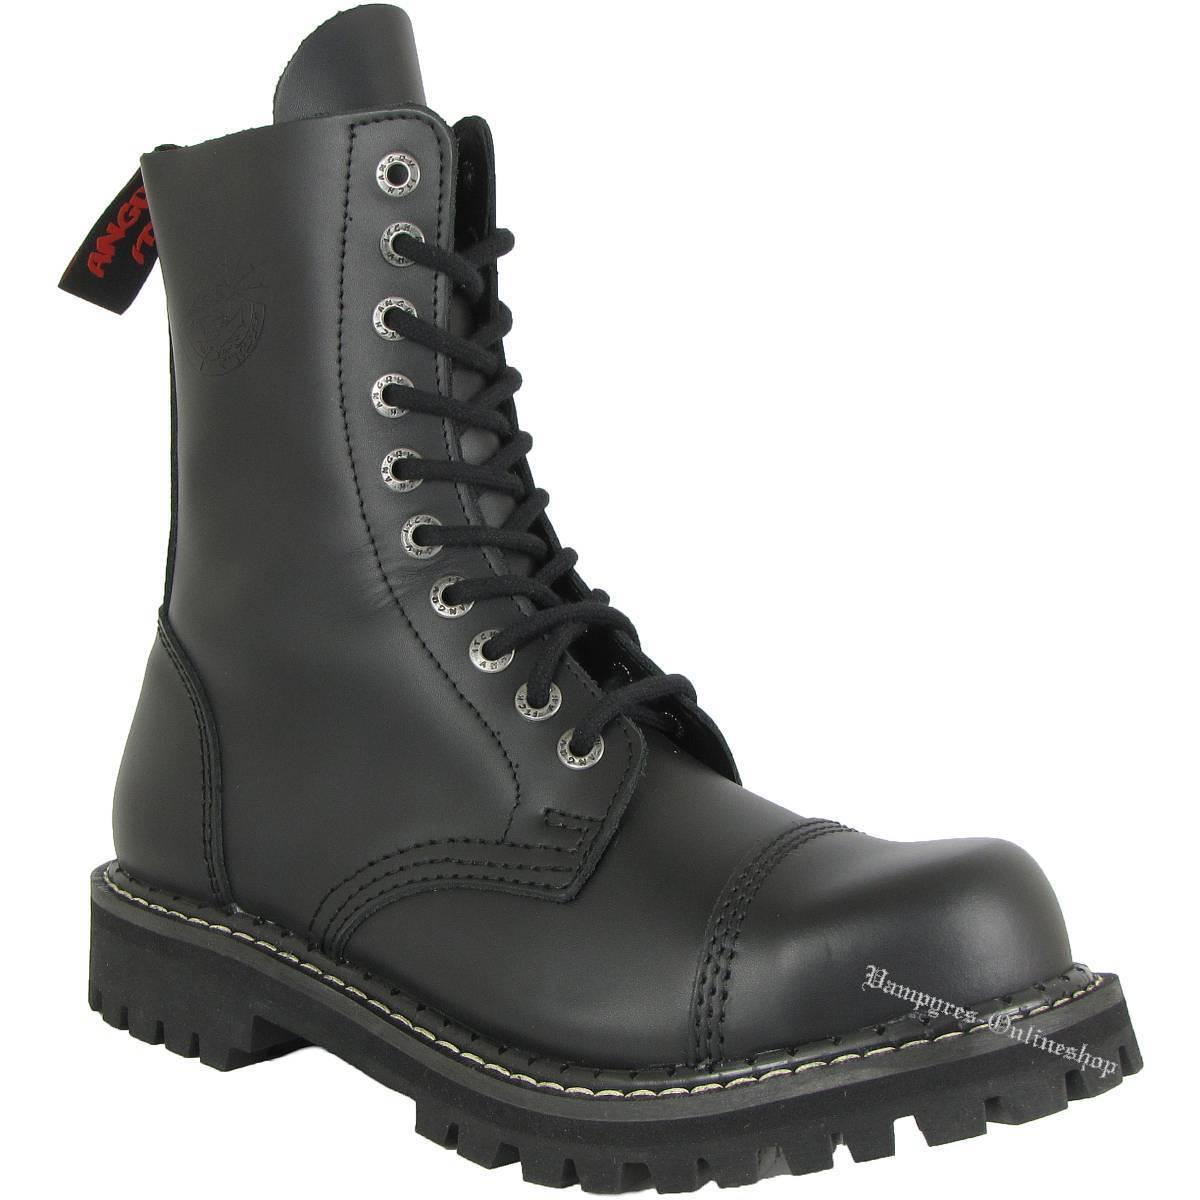 Angry Itch 10-agujero negro rangers botas de cuero acero tapas Boots zapatos Black